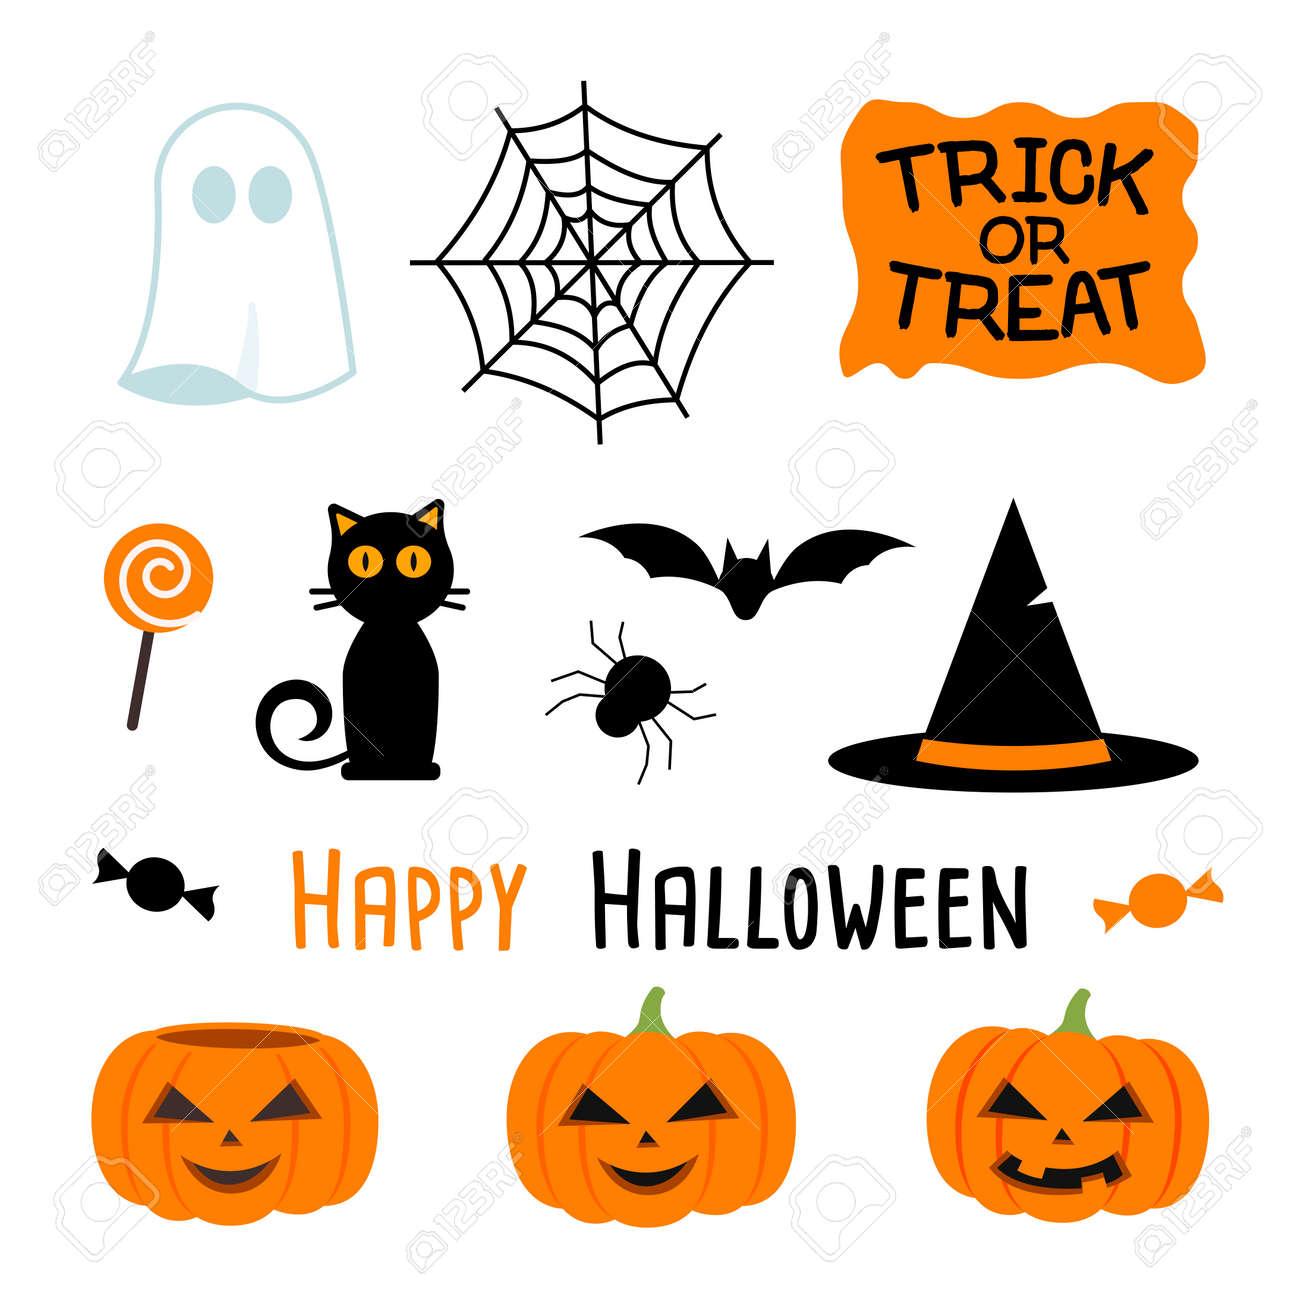 vector illustration of halloween party set - 157417184